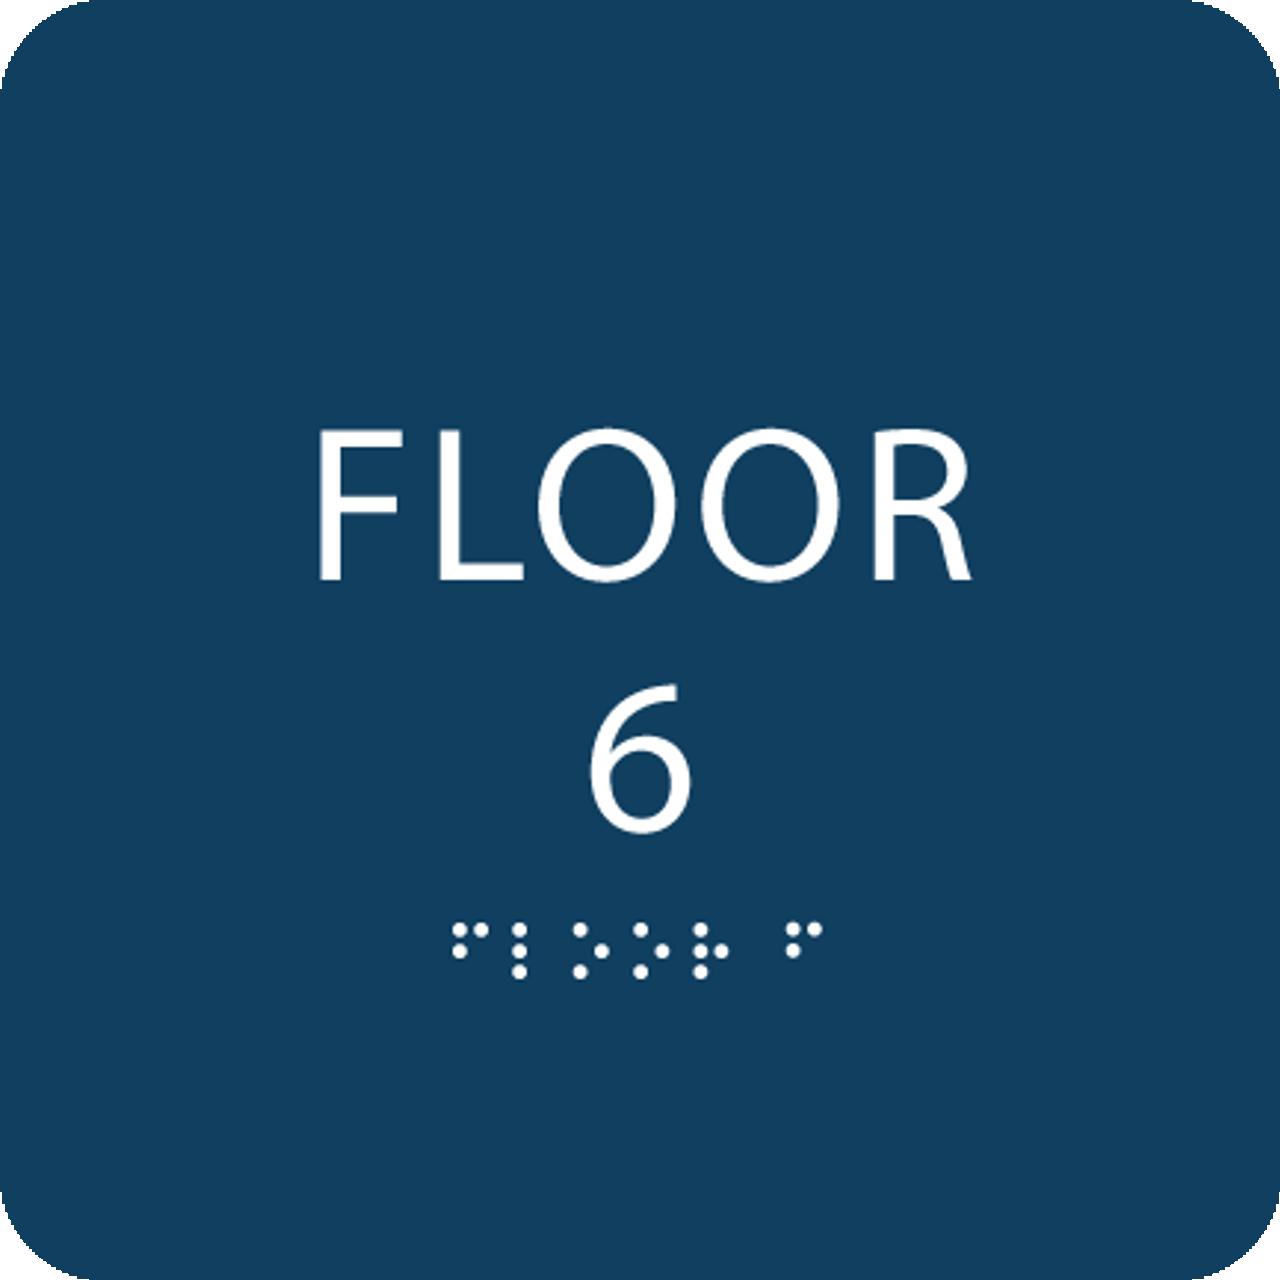 Dark Blue Floor 6 Level Identification ADA Sign